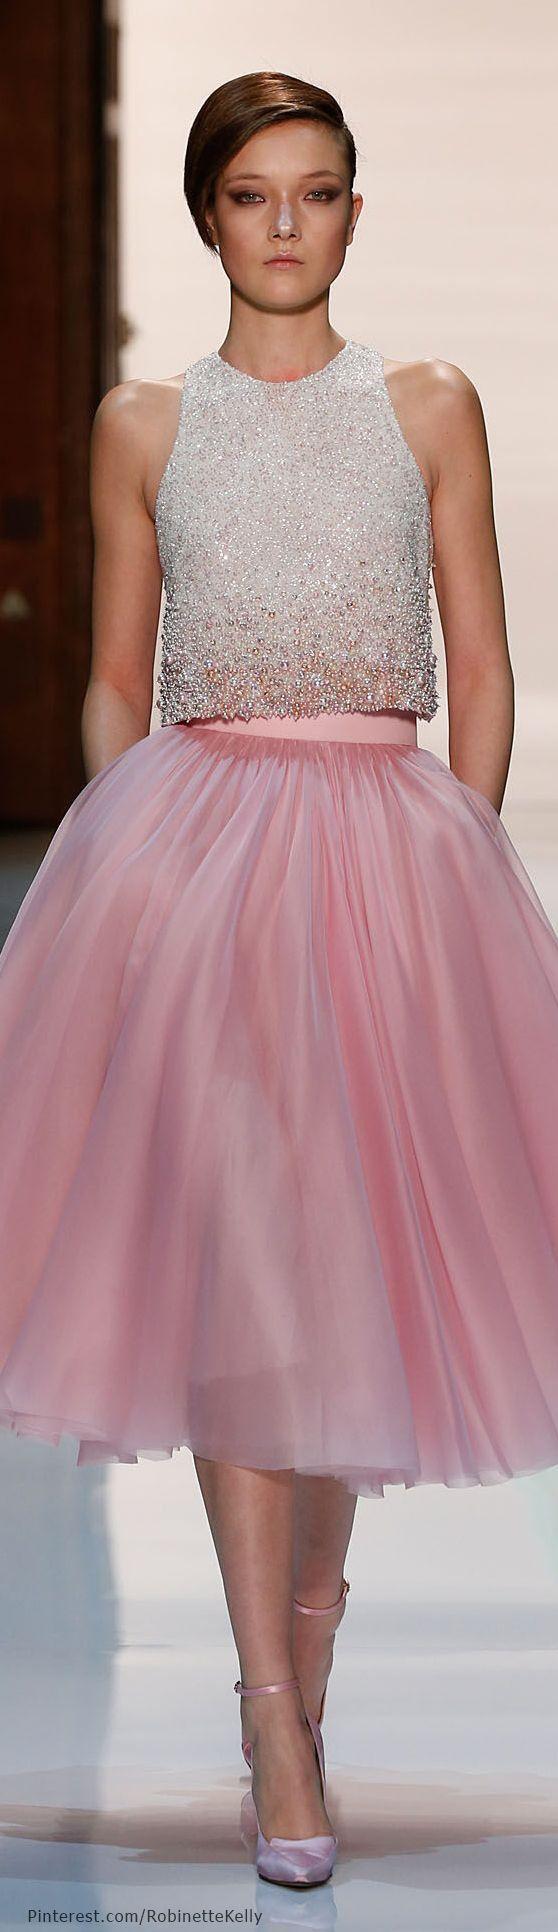 Pin de GilliMarie Diamonds en Bridal Bounty | Pinterest | Vestiditos ...